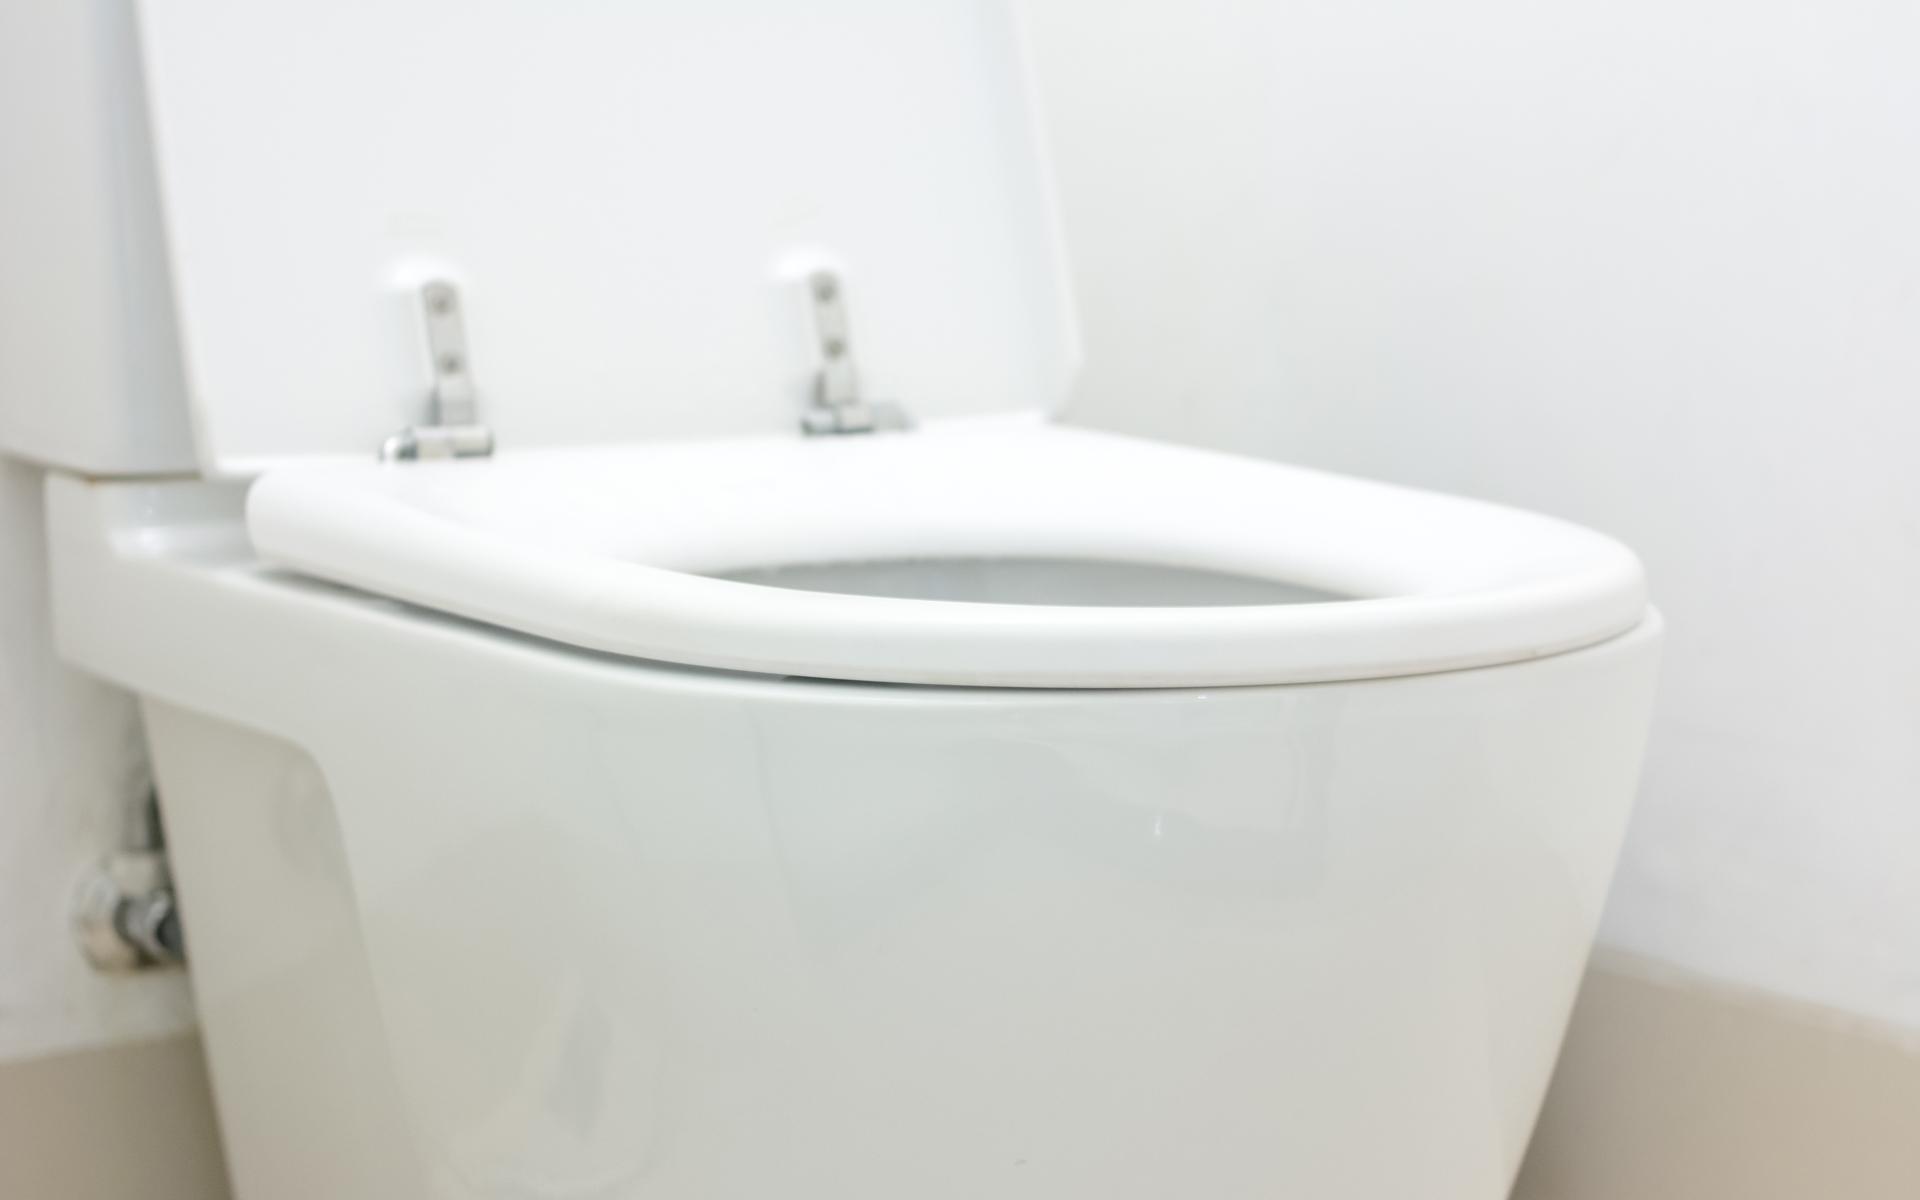 Mississauga Toilet Repair